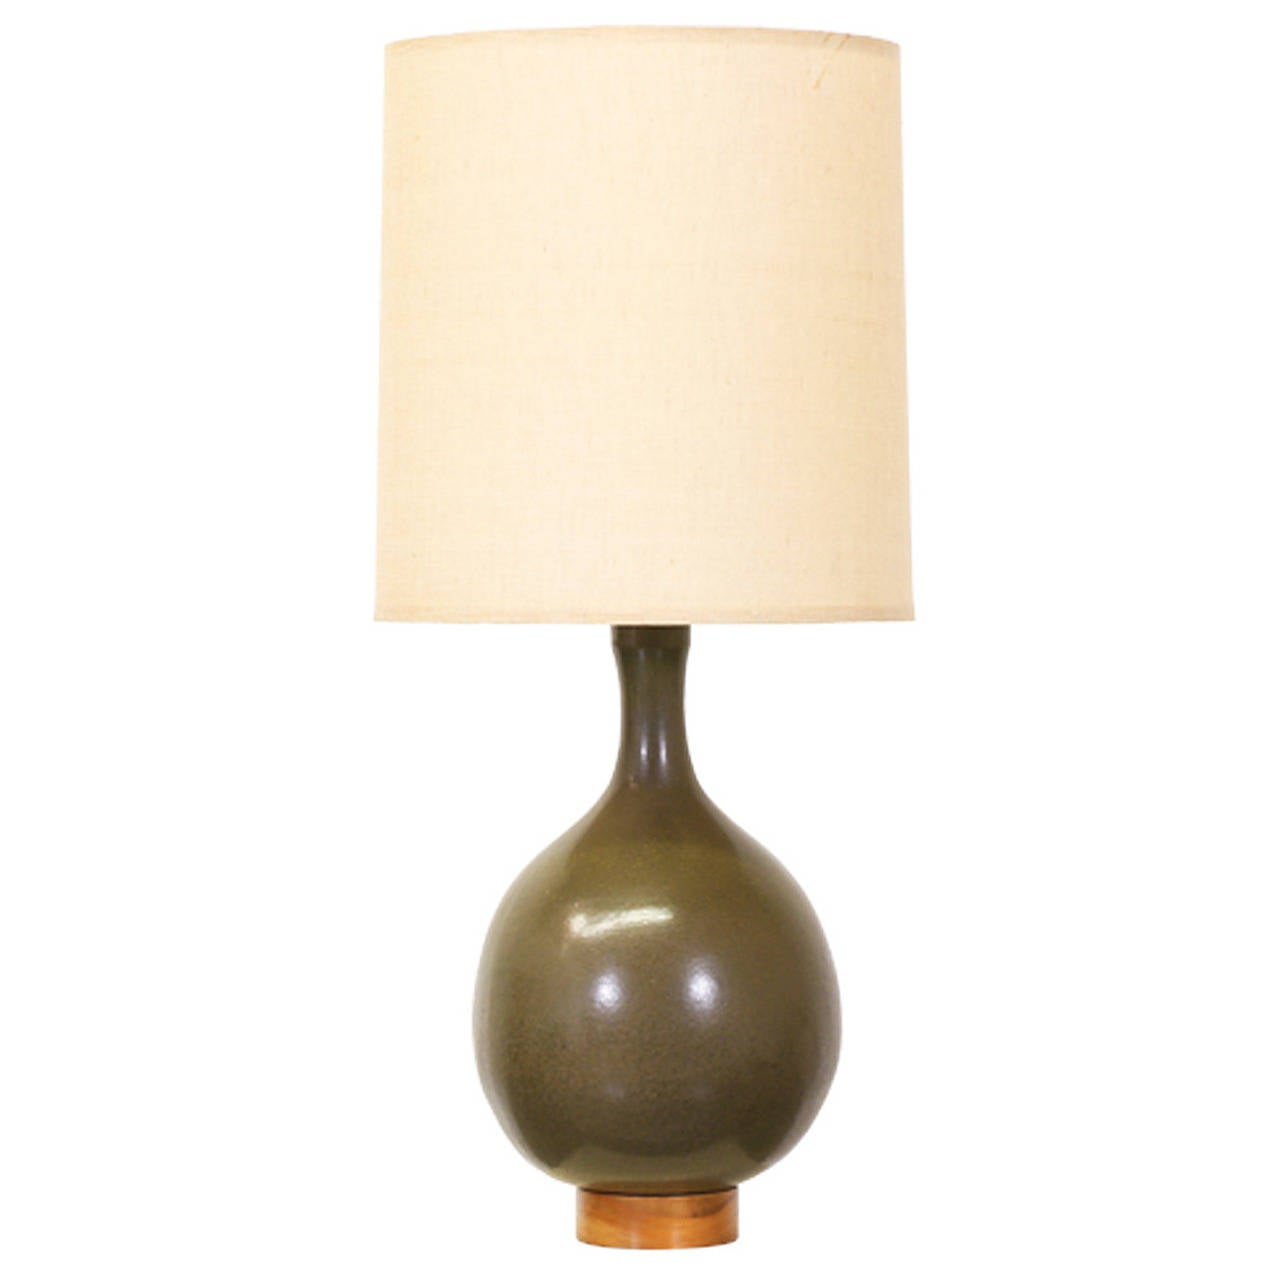 David cressey olive green ceramic table lamp at 1stdibs